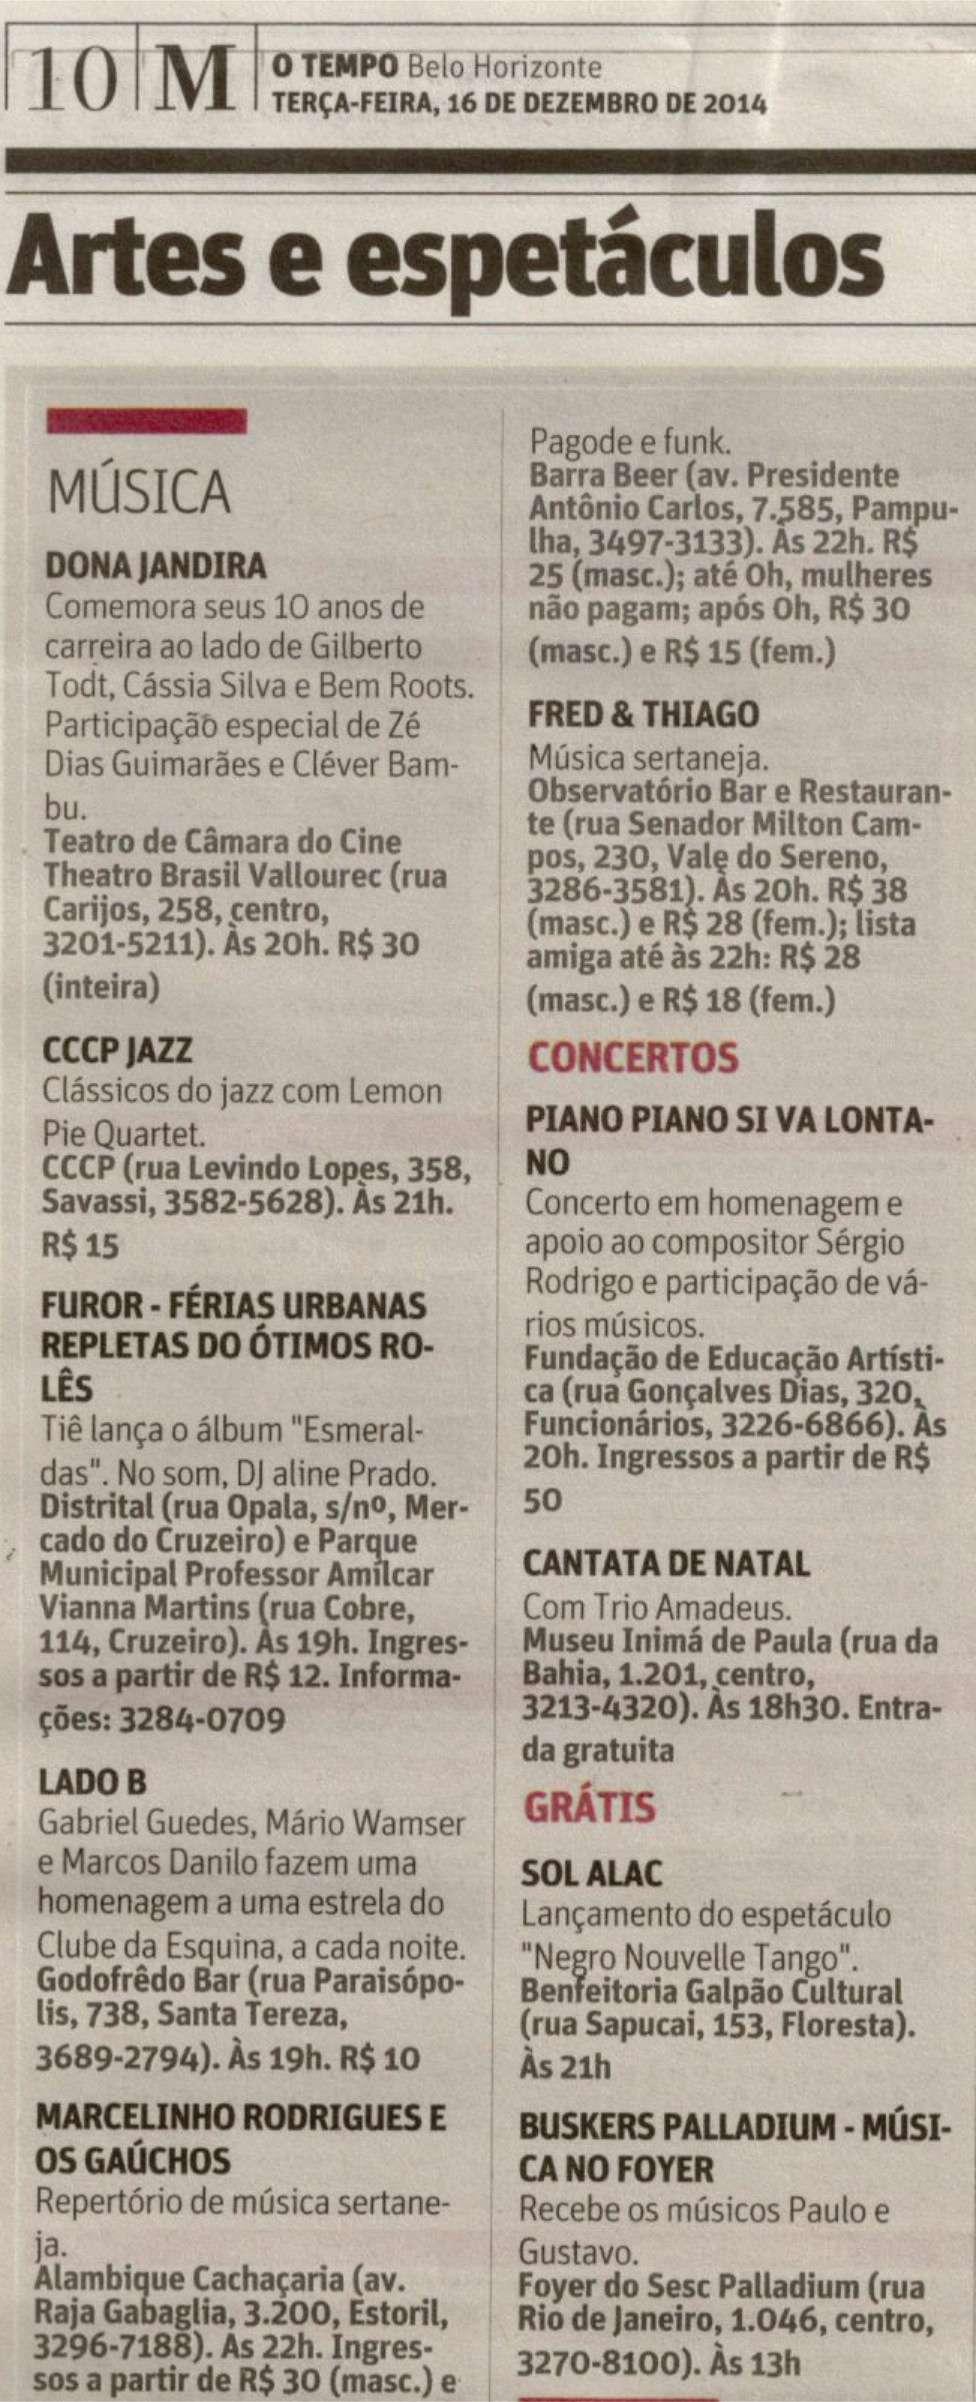 Inim+í de Paula - Jornal O Tempo - 16-12-2014 (1).jpg